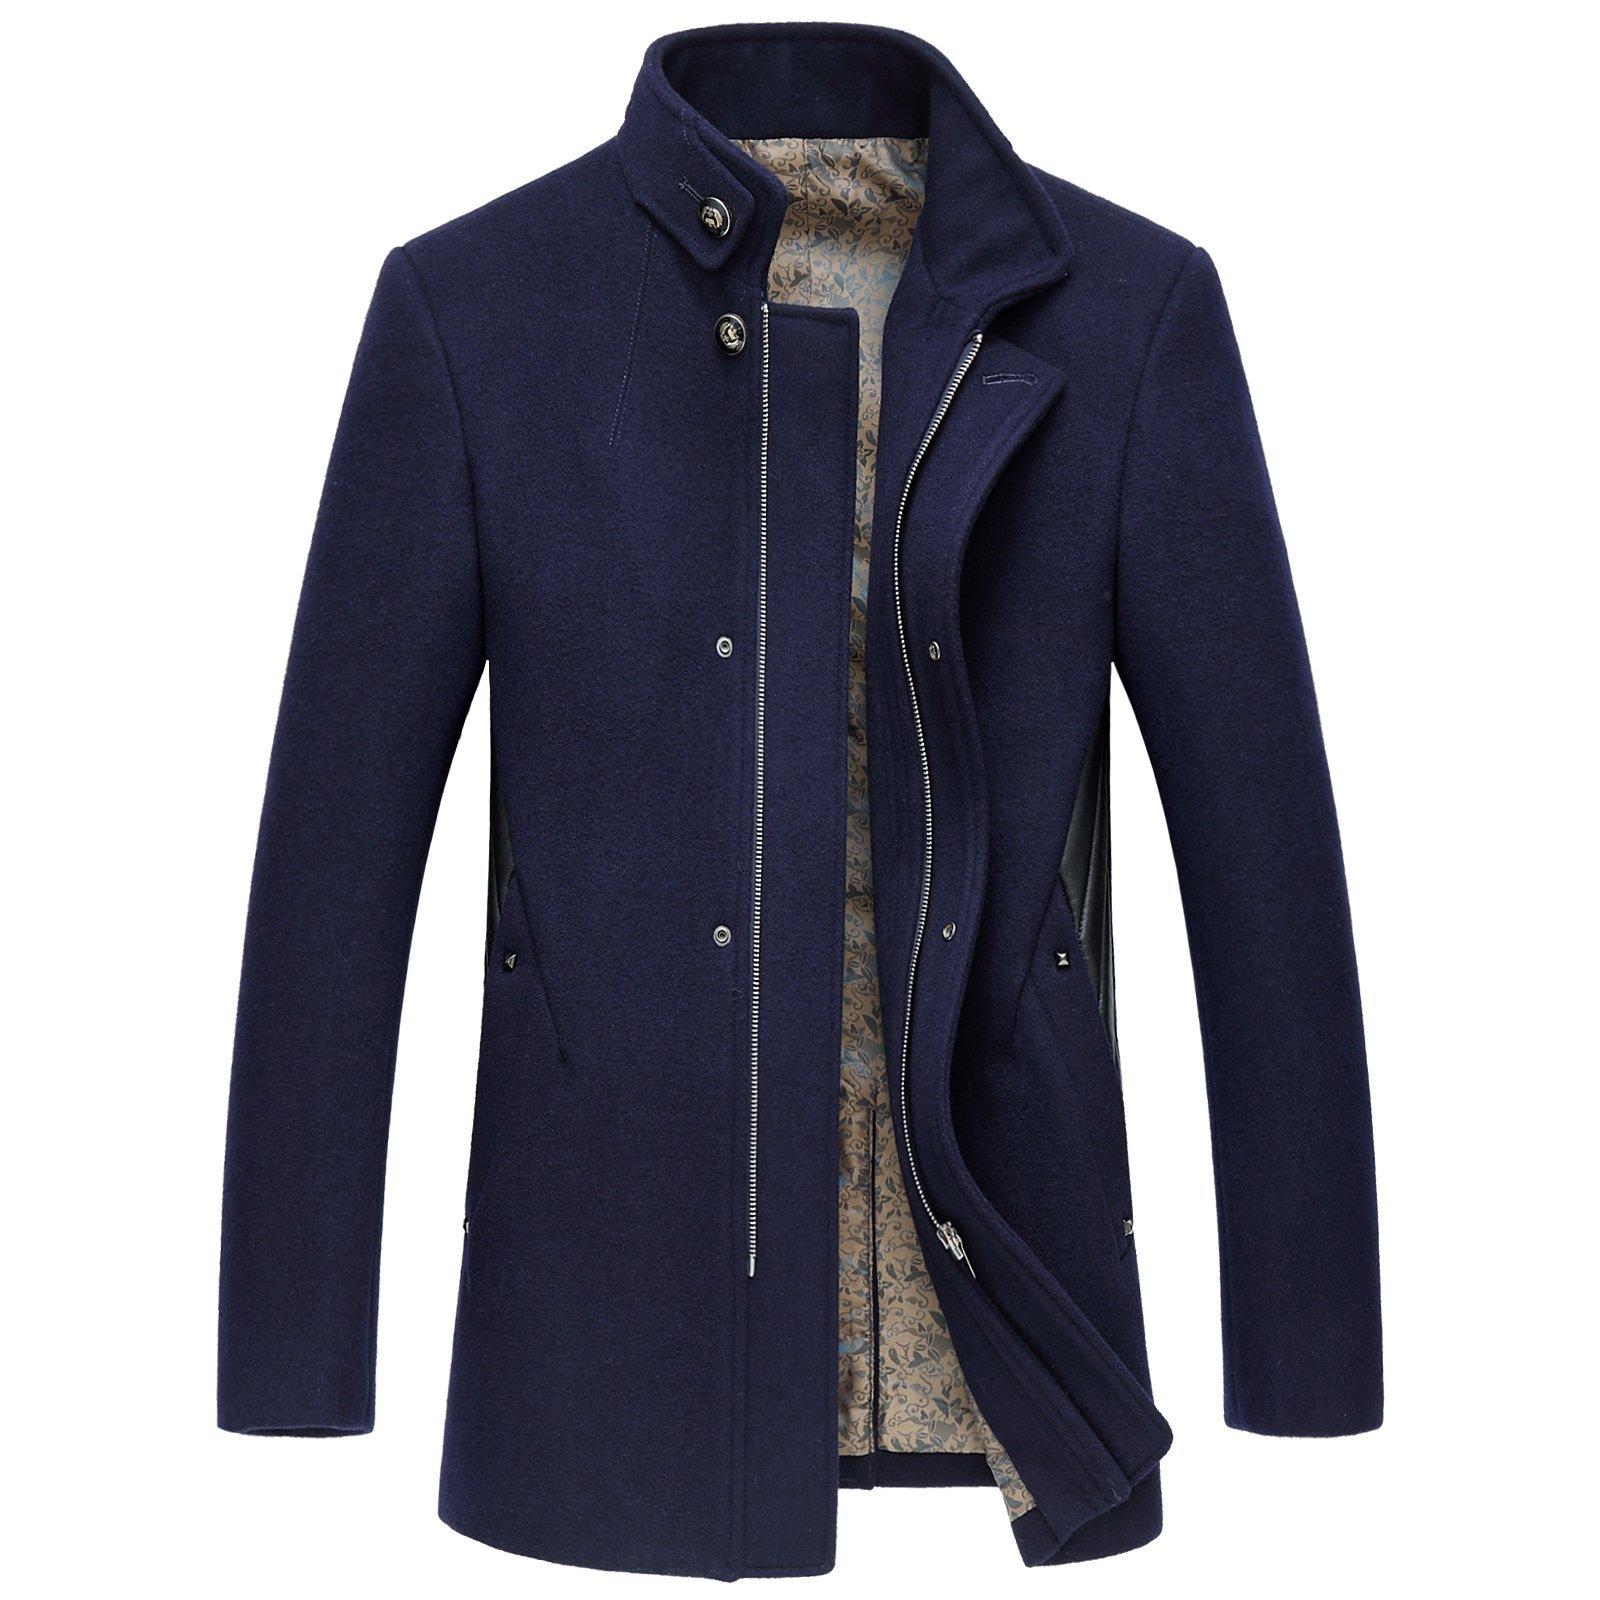 Fortuning's JDS Winter Warm Short Woolen Stand Collar Single Breasted Slim Business Coat Jacket for Men